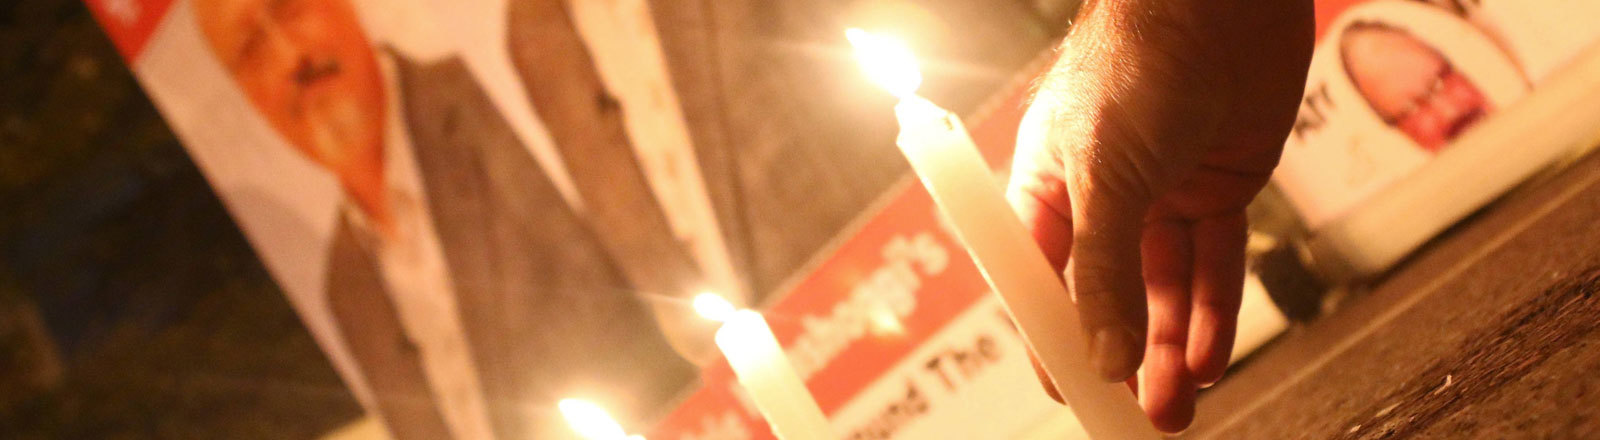 Gedenken an Jamal Khashoggi.